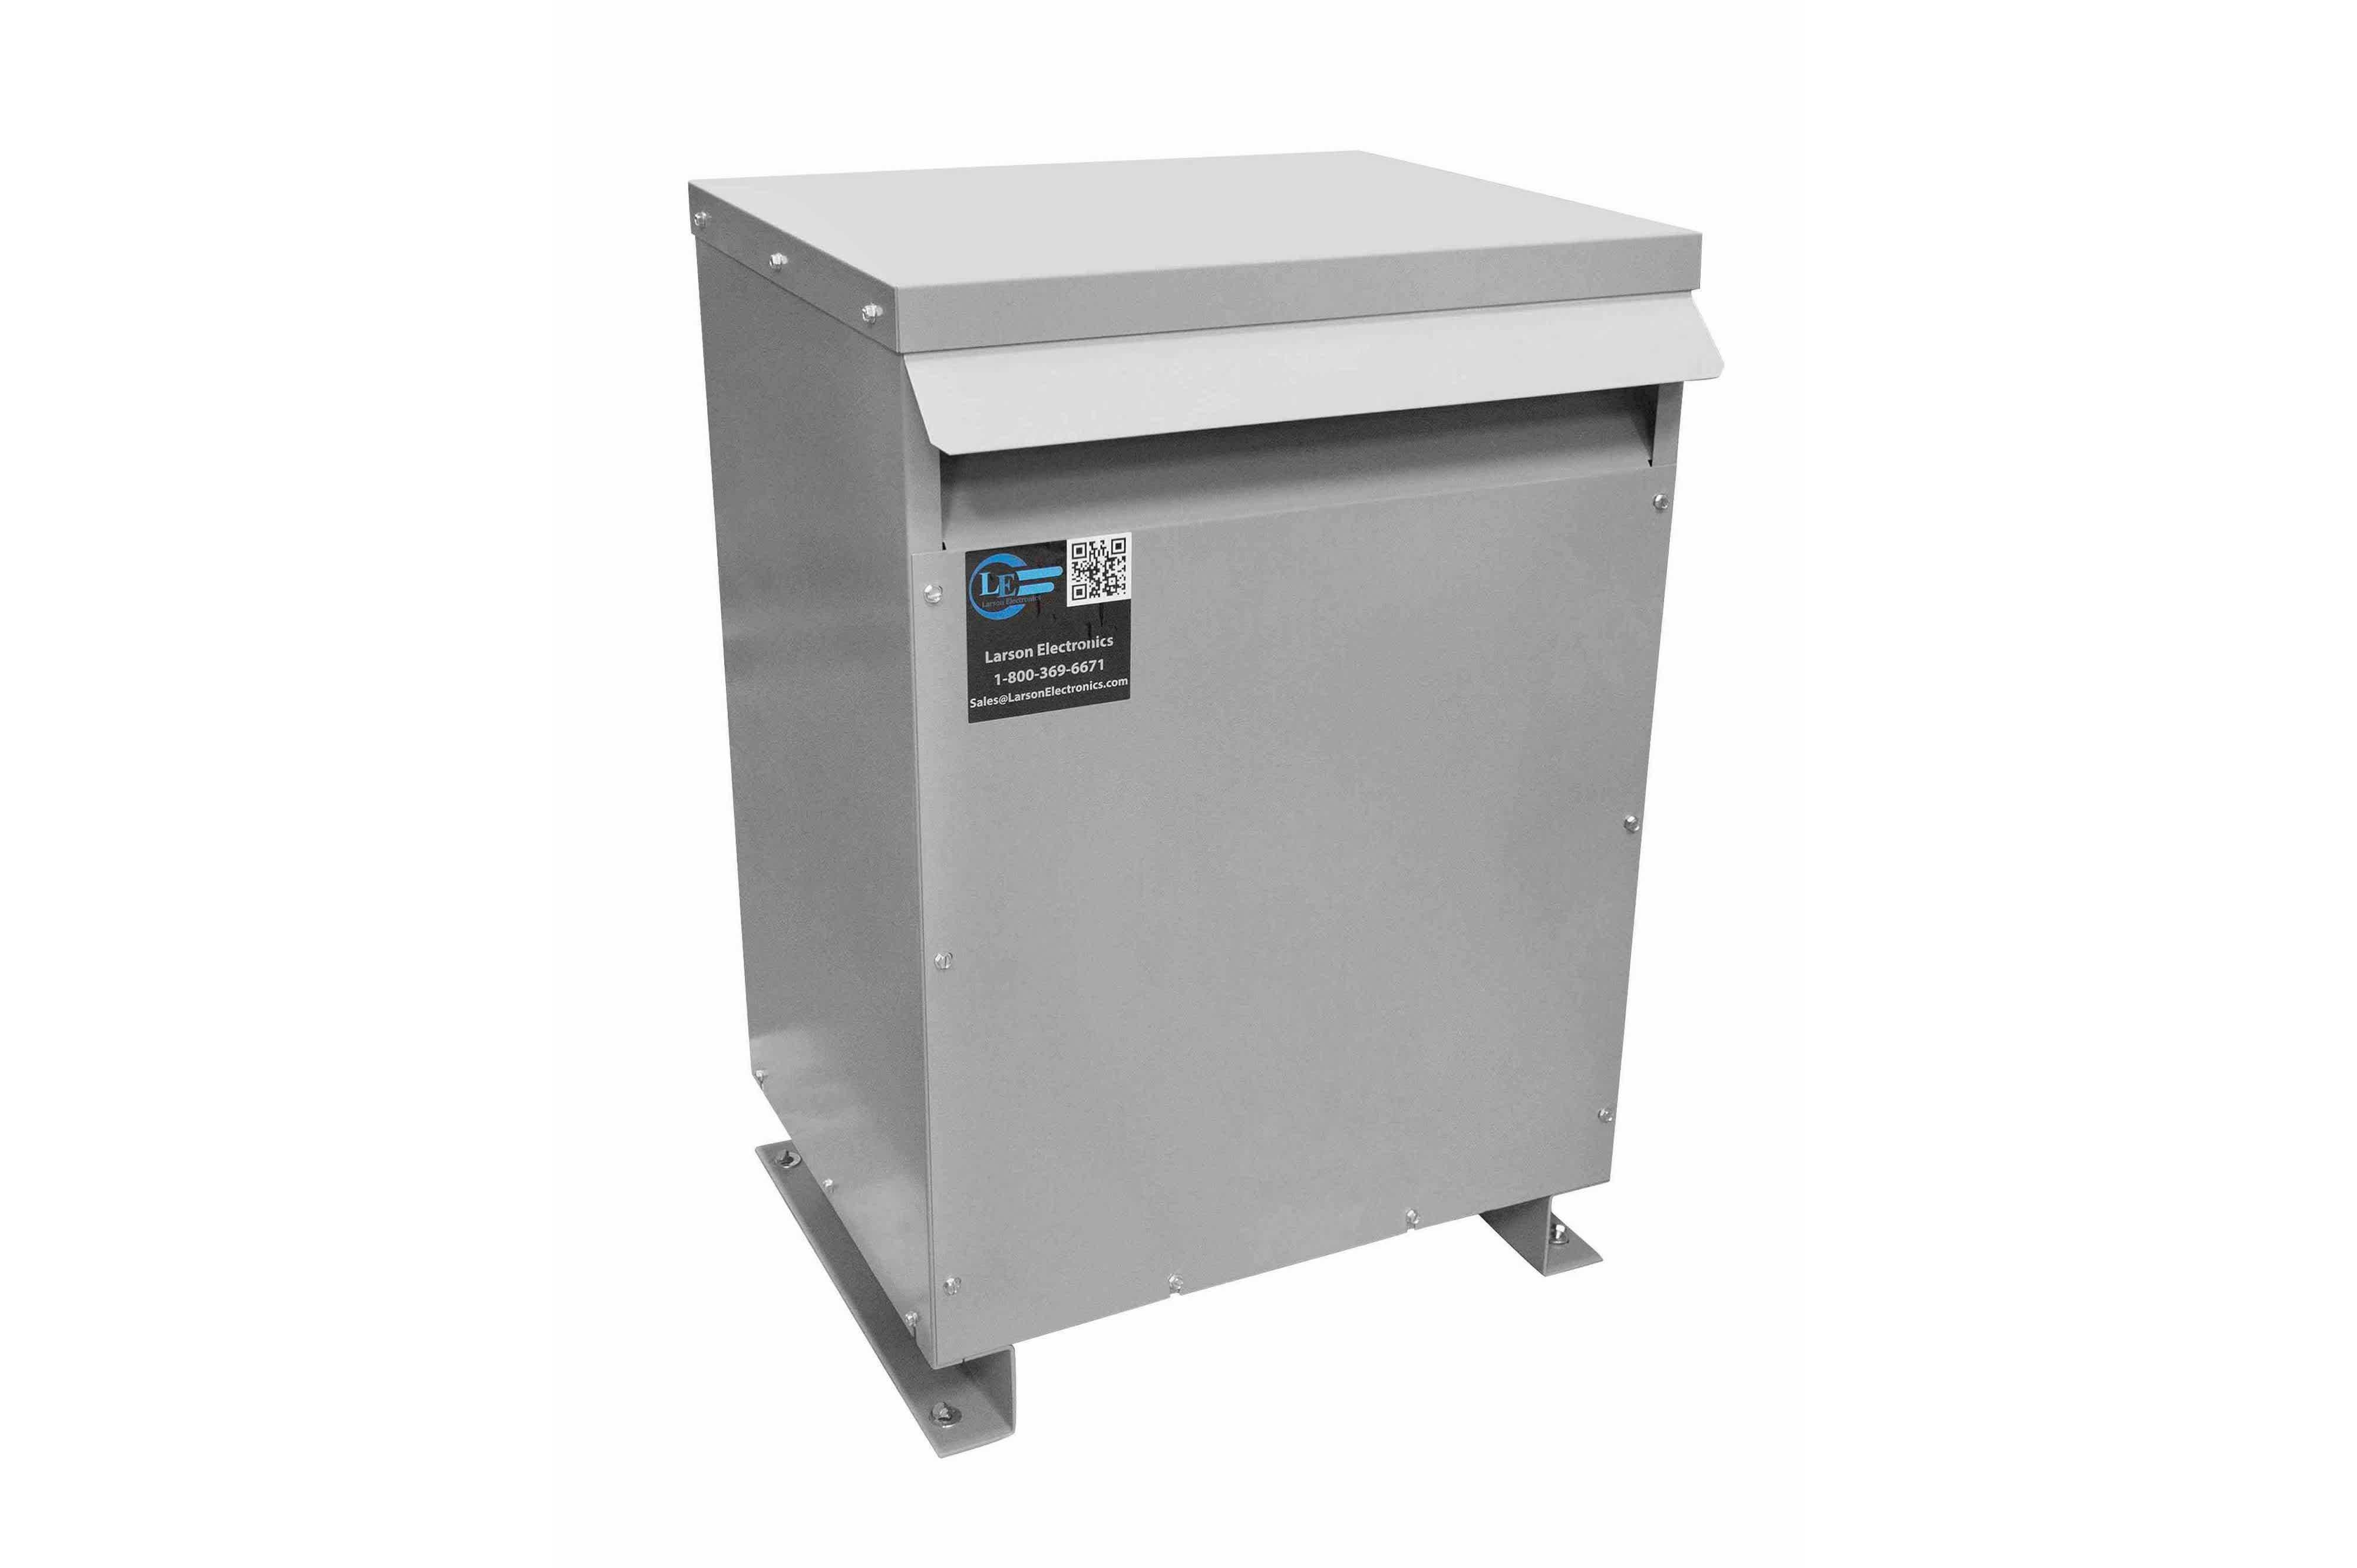 12 kVA 3PH Isolation Transformer, 208V Wye Primary, 208Y/120 Wye-N Secondary, N3R, Ventilated, 60 Hz